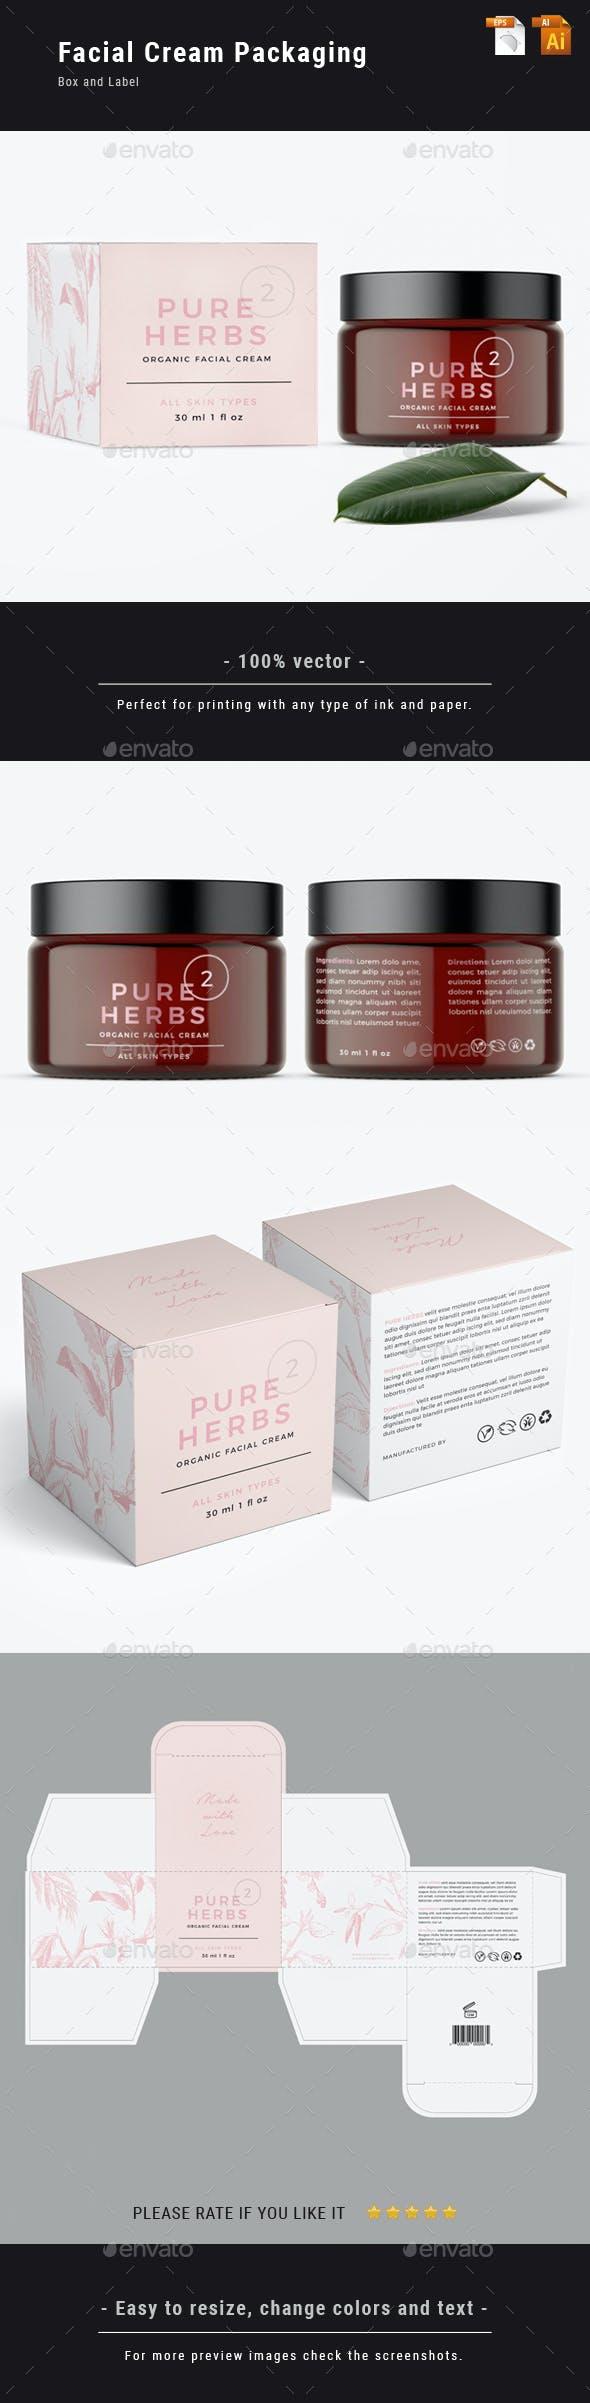 Organic Facial Cream - Label and Box